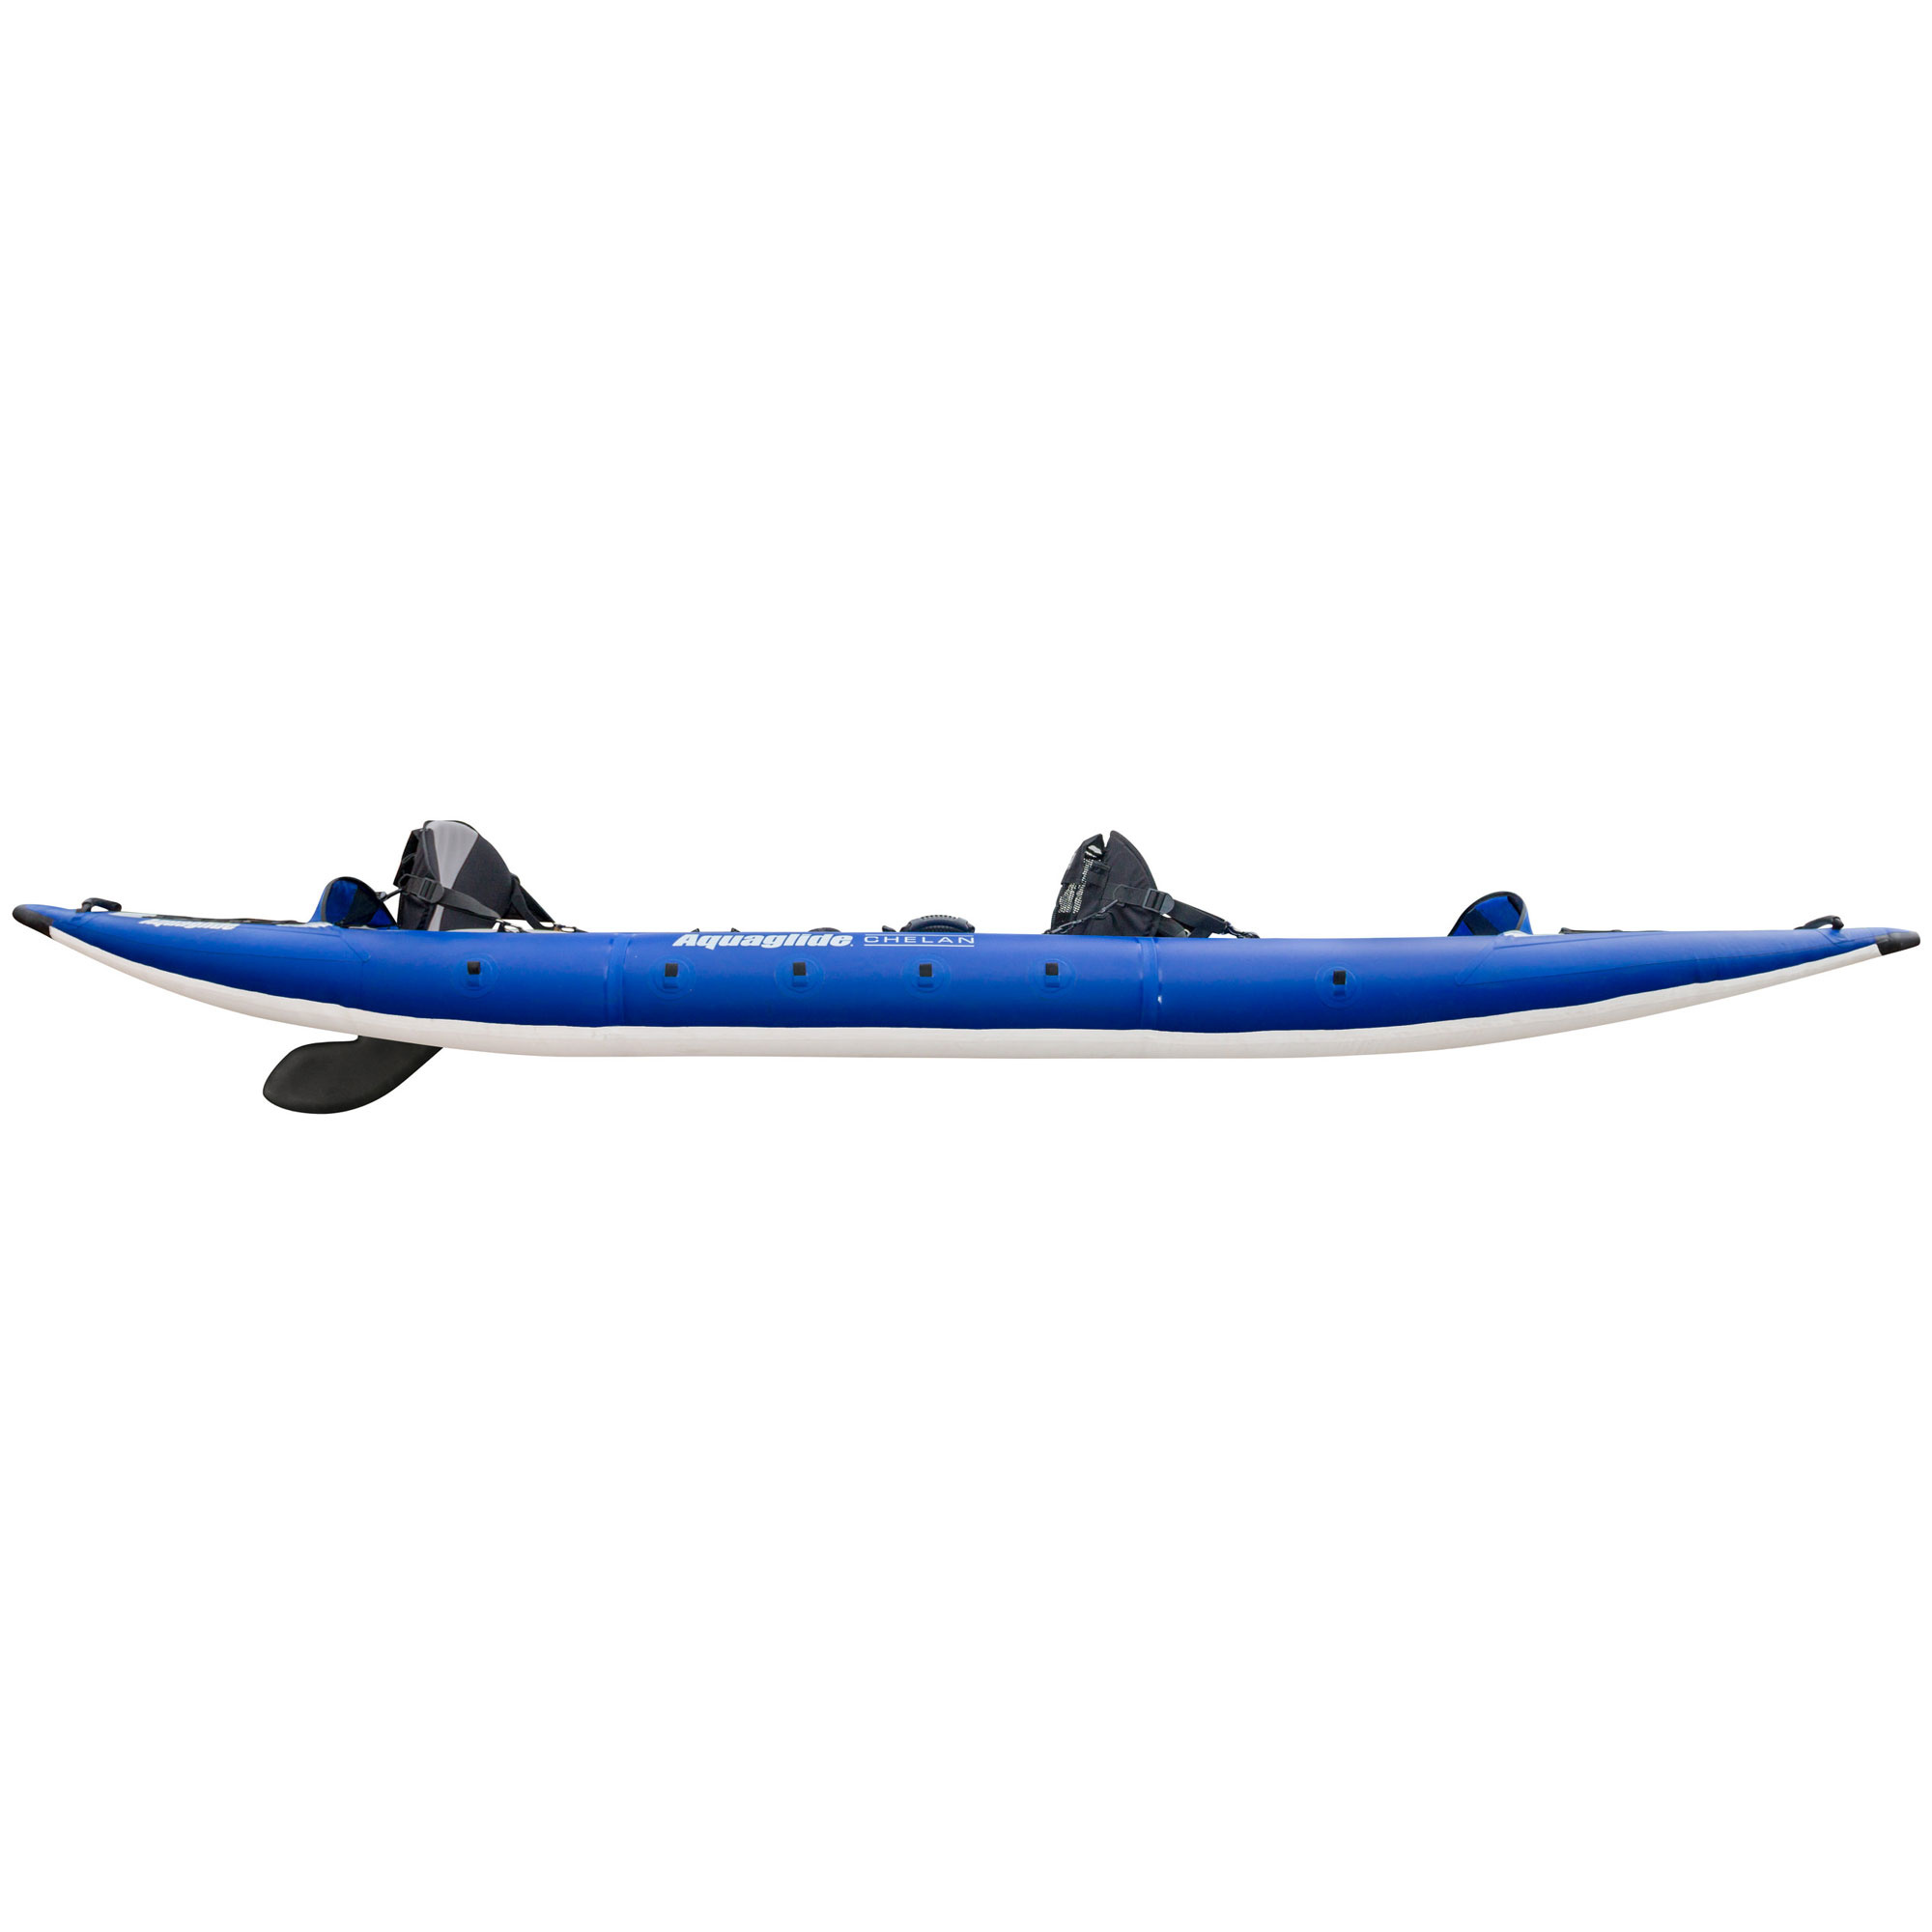 Chelan 155 HB  - Inflatable Kayak